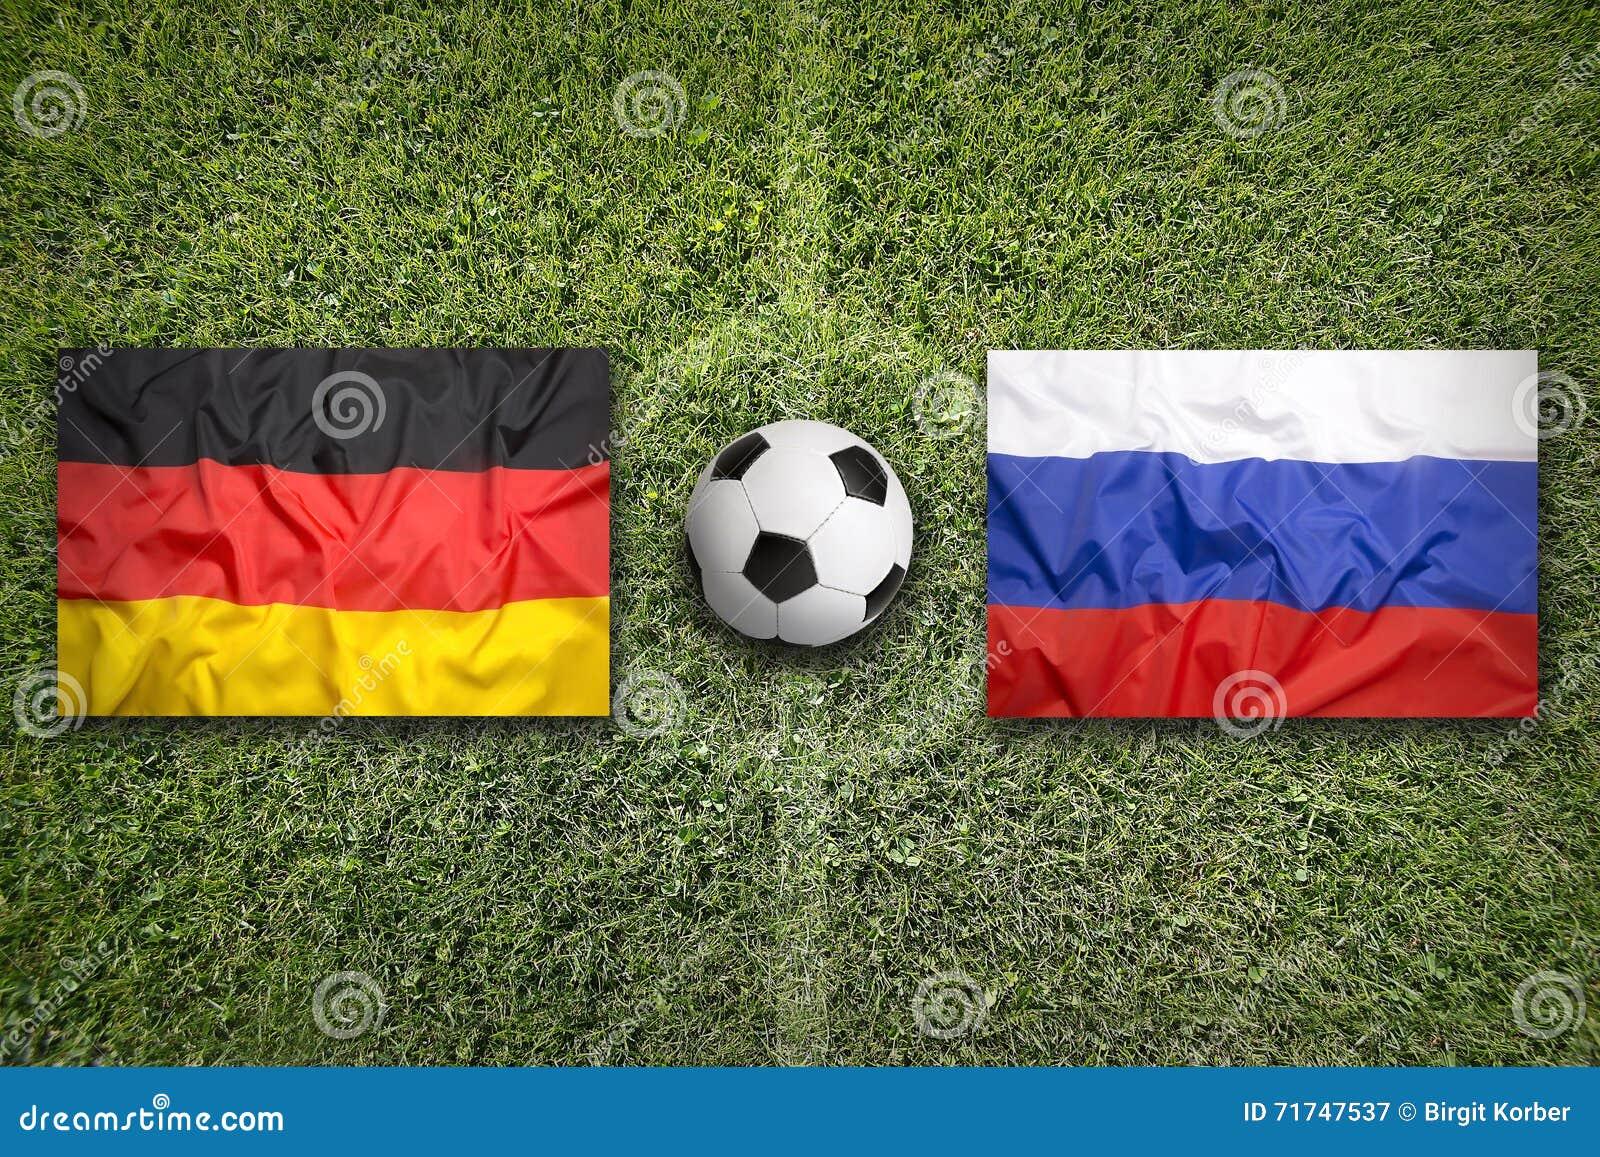 Sport in ukraine essays